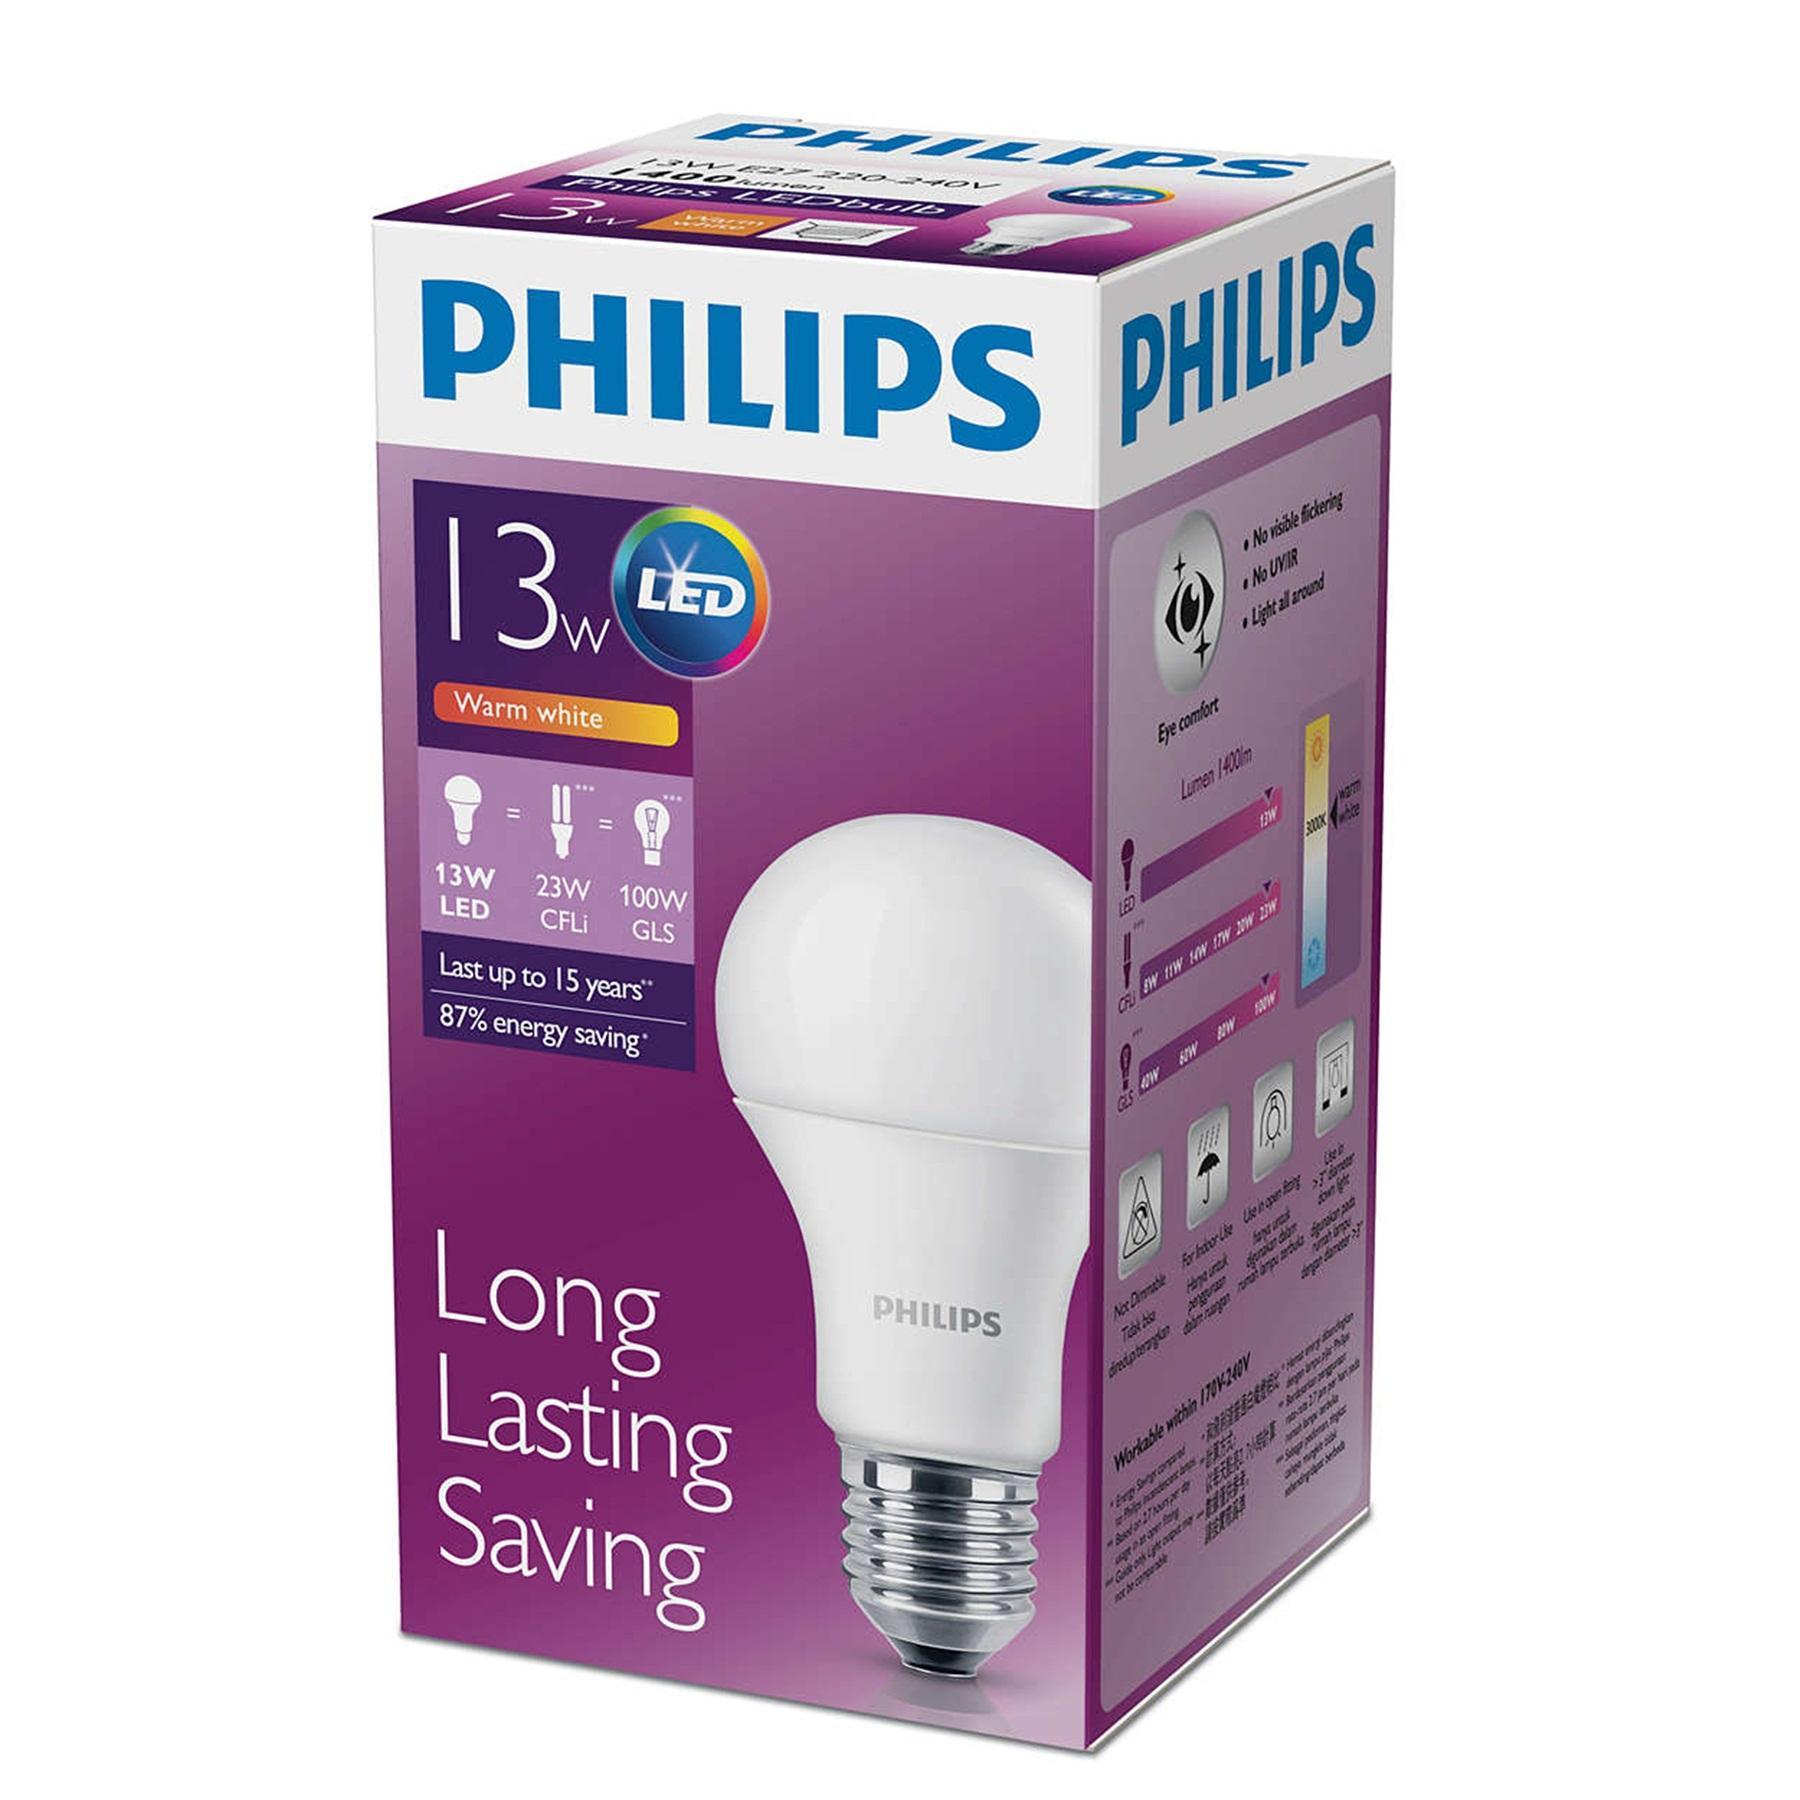 PHILIPS Bola lampu LED 13 Watt - Warm White